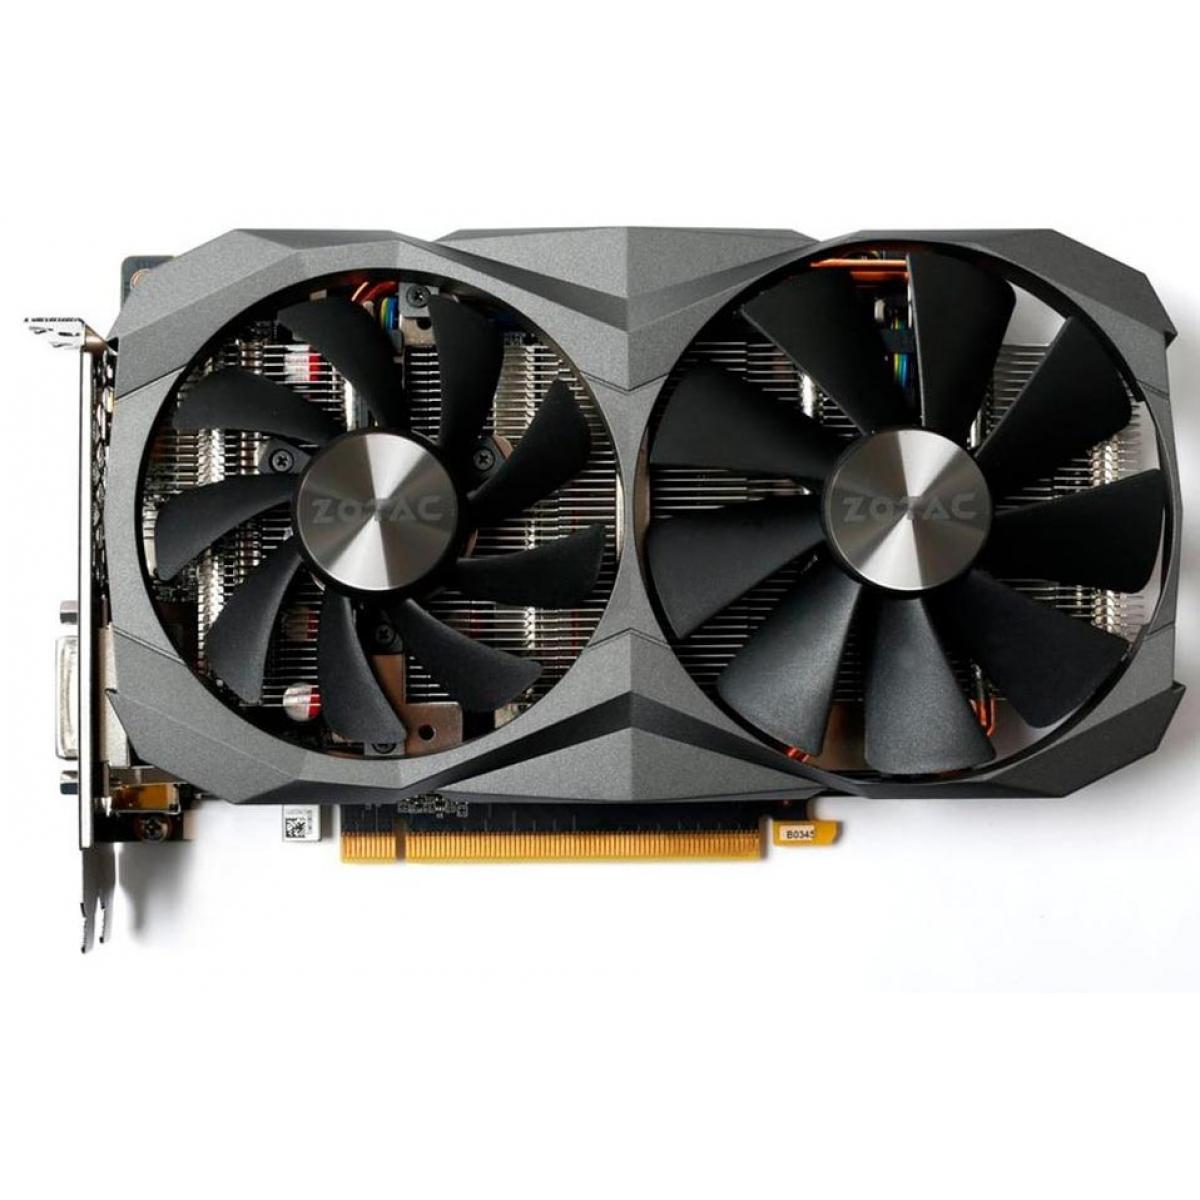 Placa de Video Zotac GeForce GTX 1060 Dual 6GB GDDR5X, 192Bit